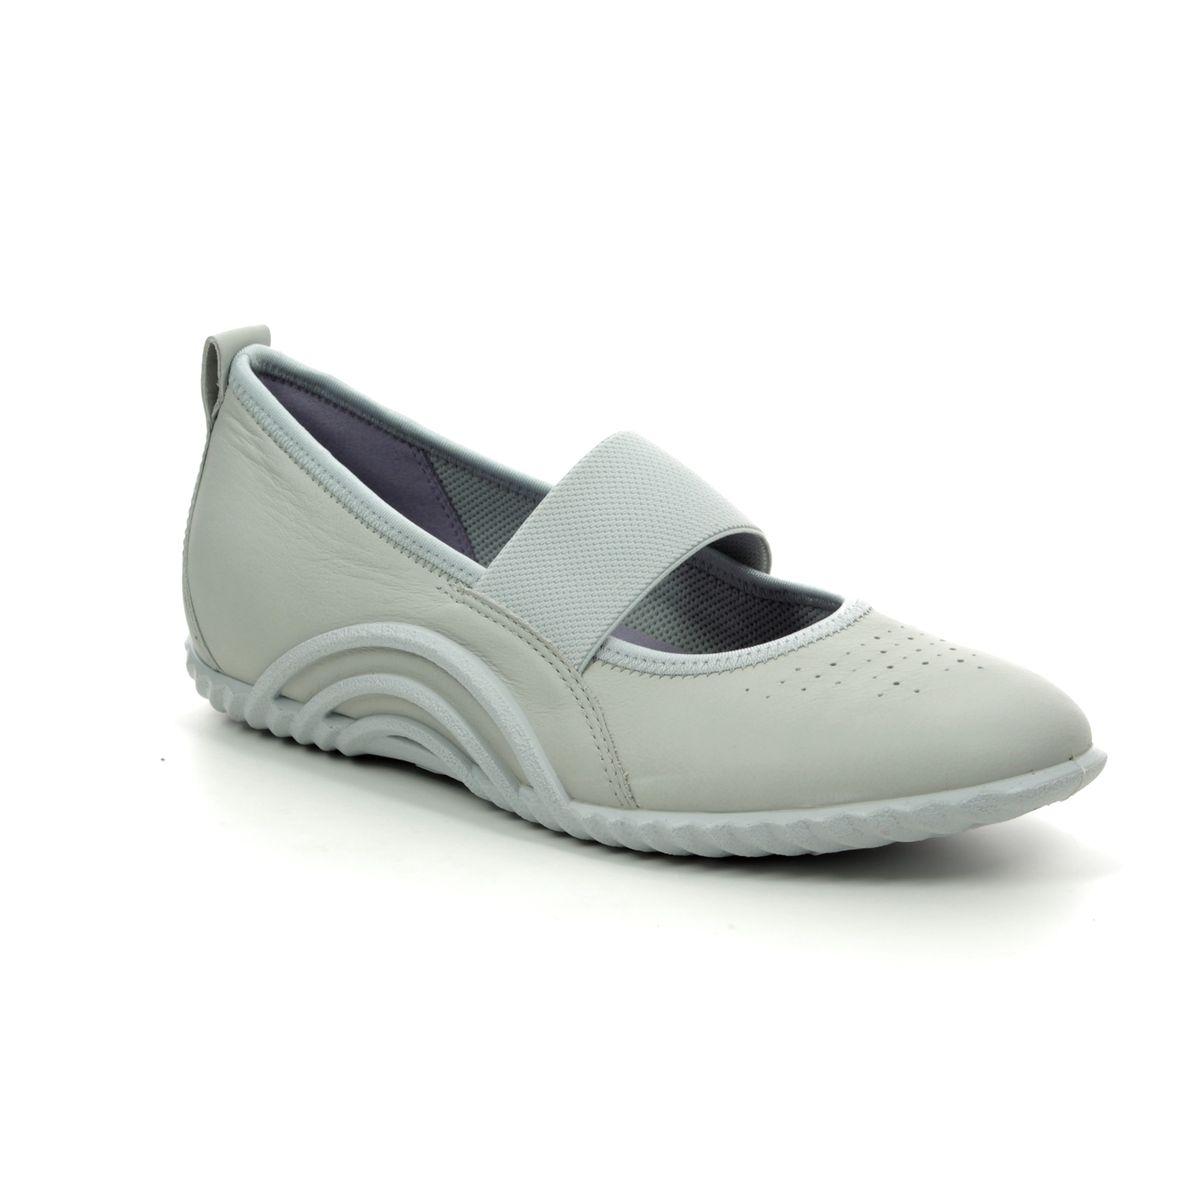 a0815b15ed11 ECCO Mary Jane Shoes - Light Grey - 206133 01379 VIBRATION 1.0